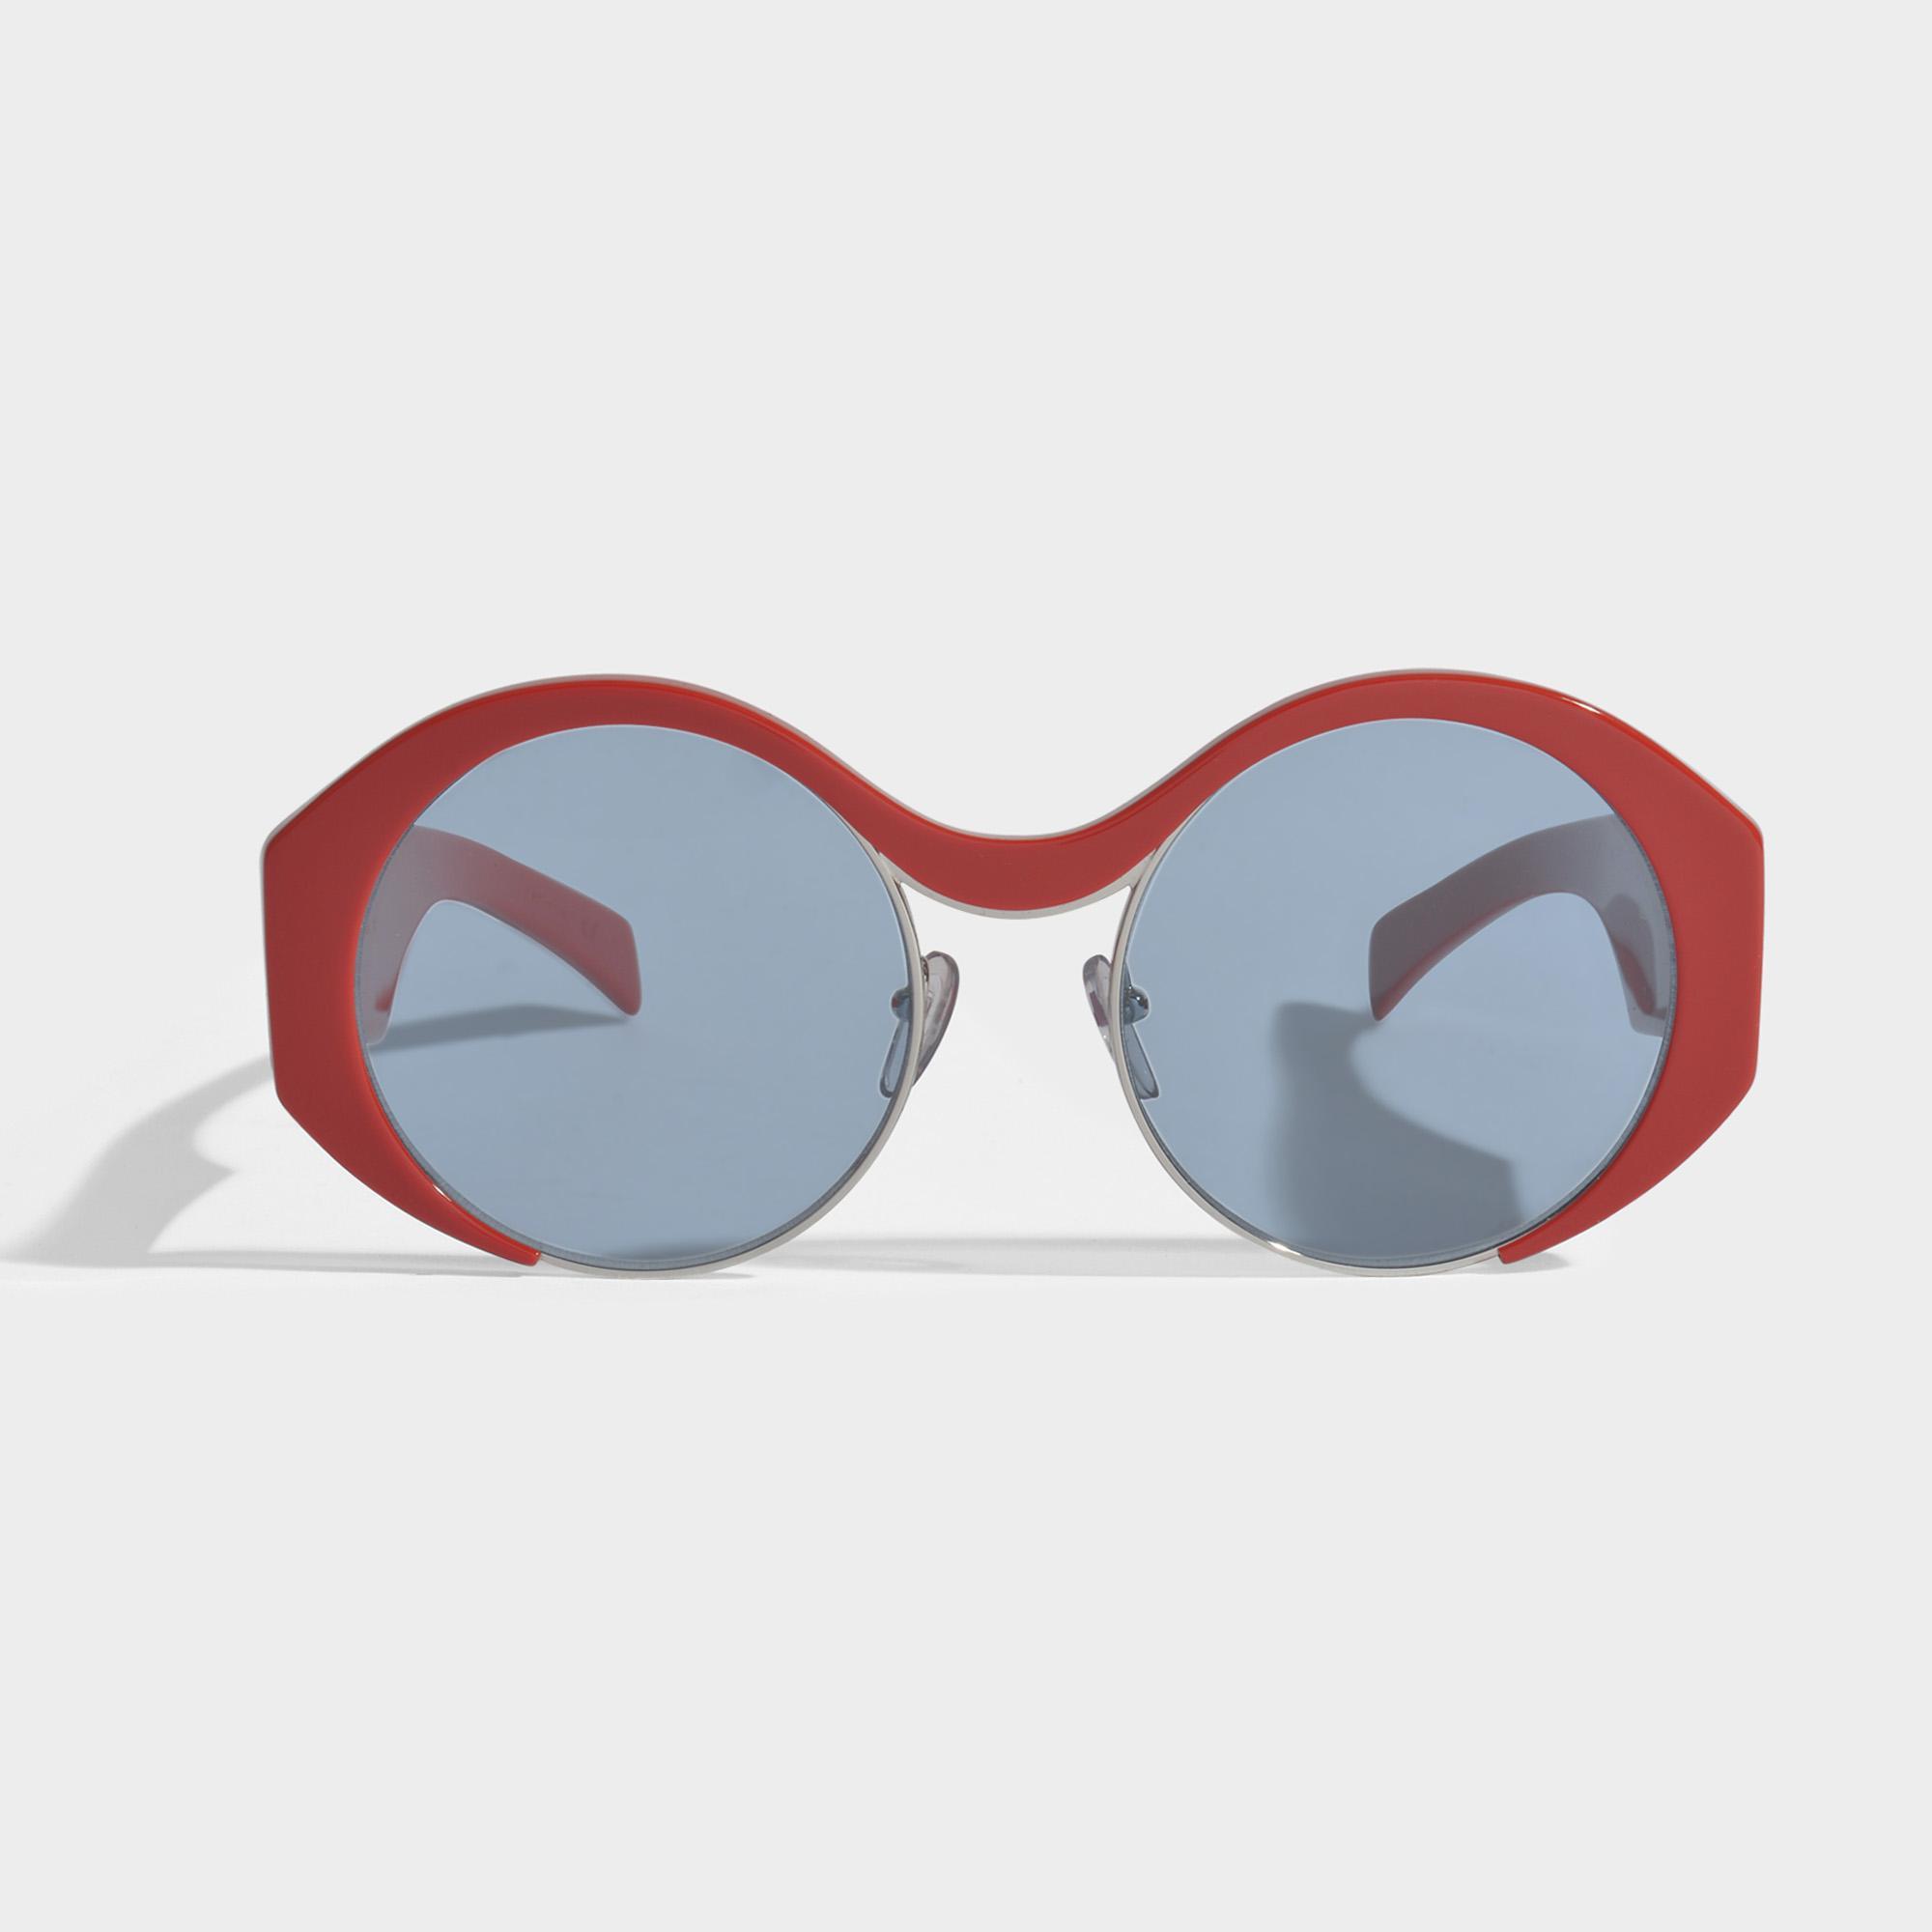 Show Round Sunglasses in Burnt Acetate and Metal Marni MNIG3mKGsD